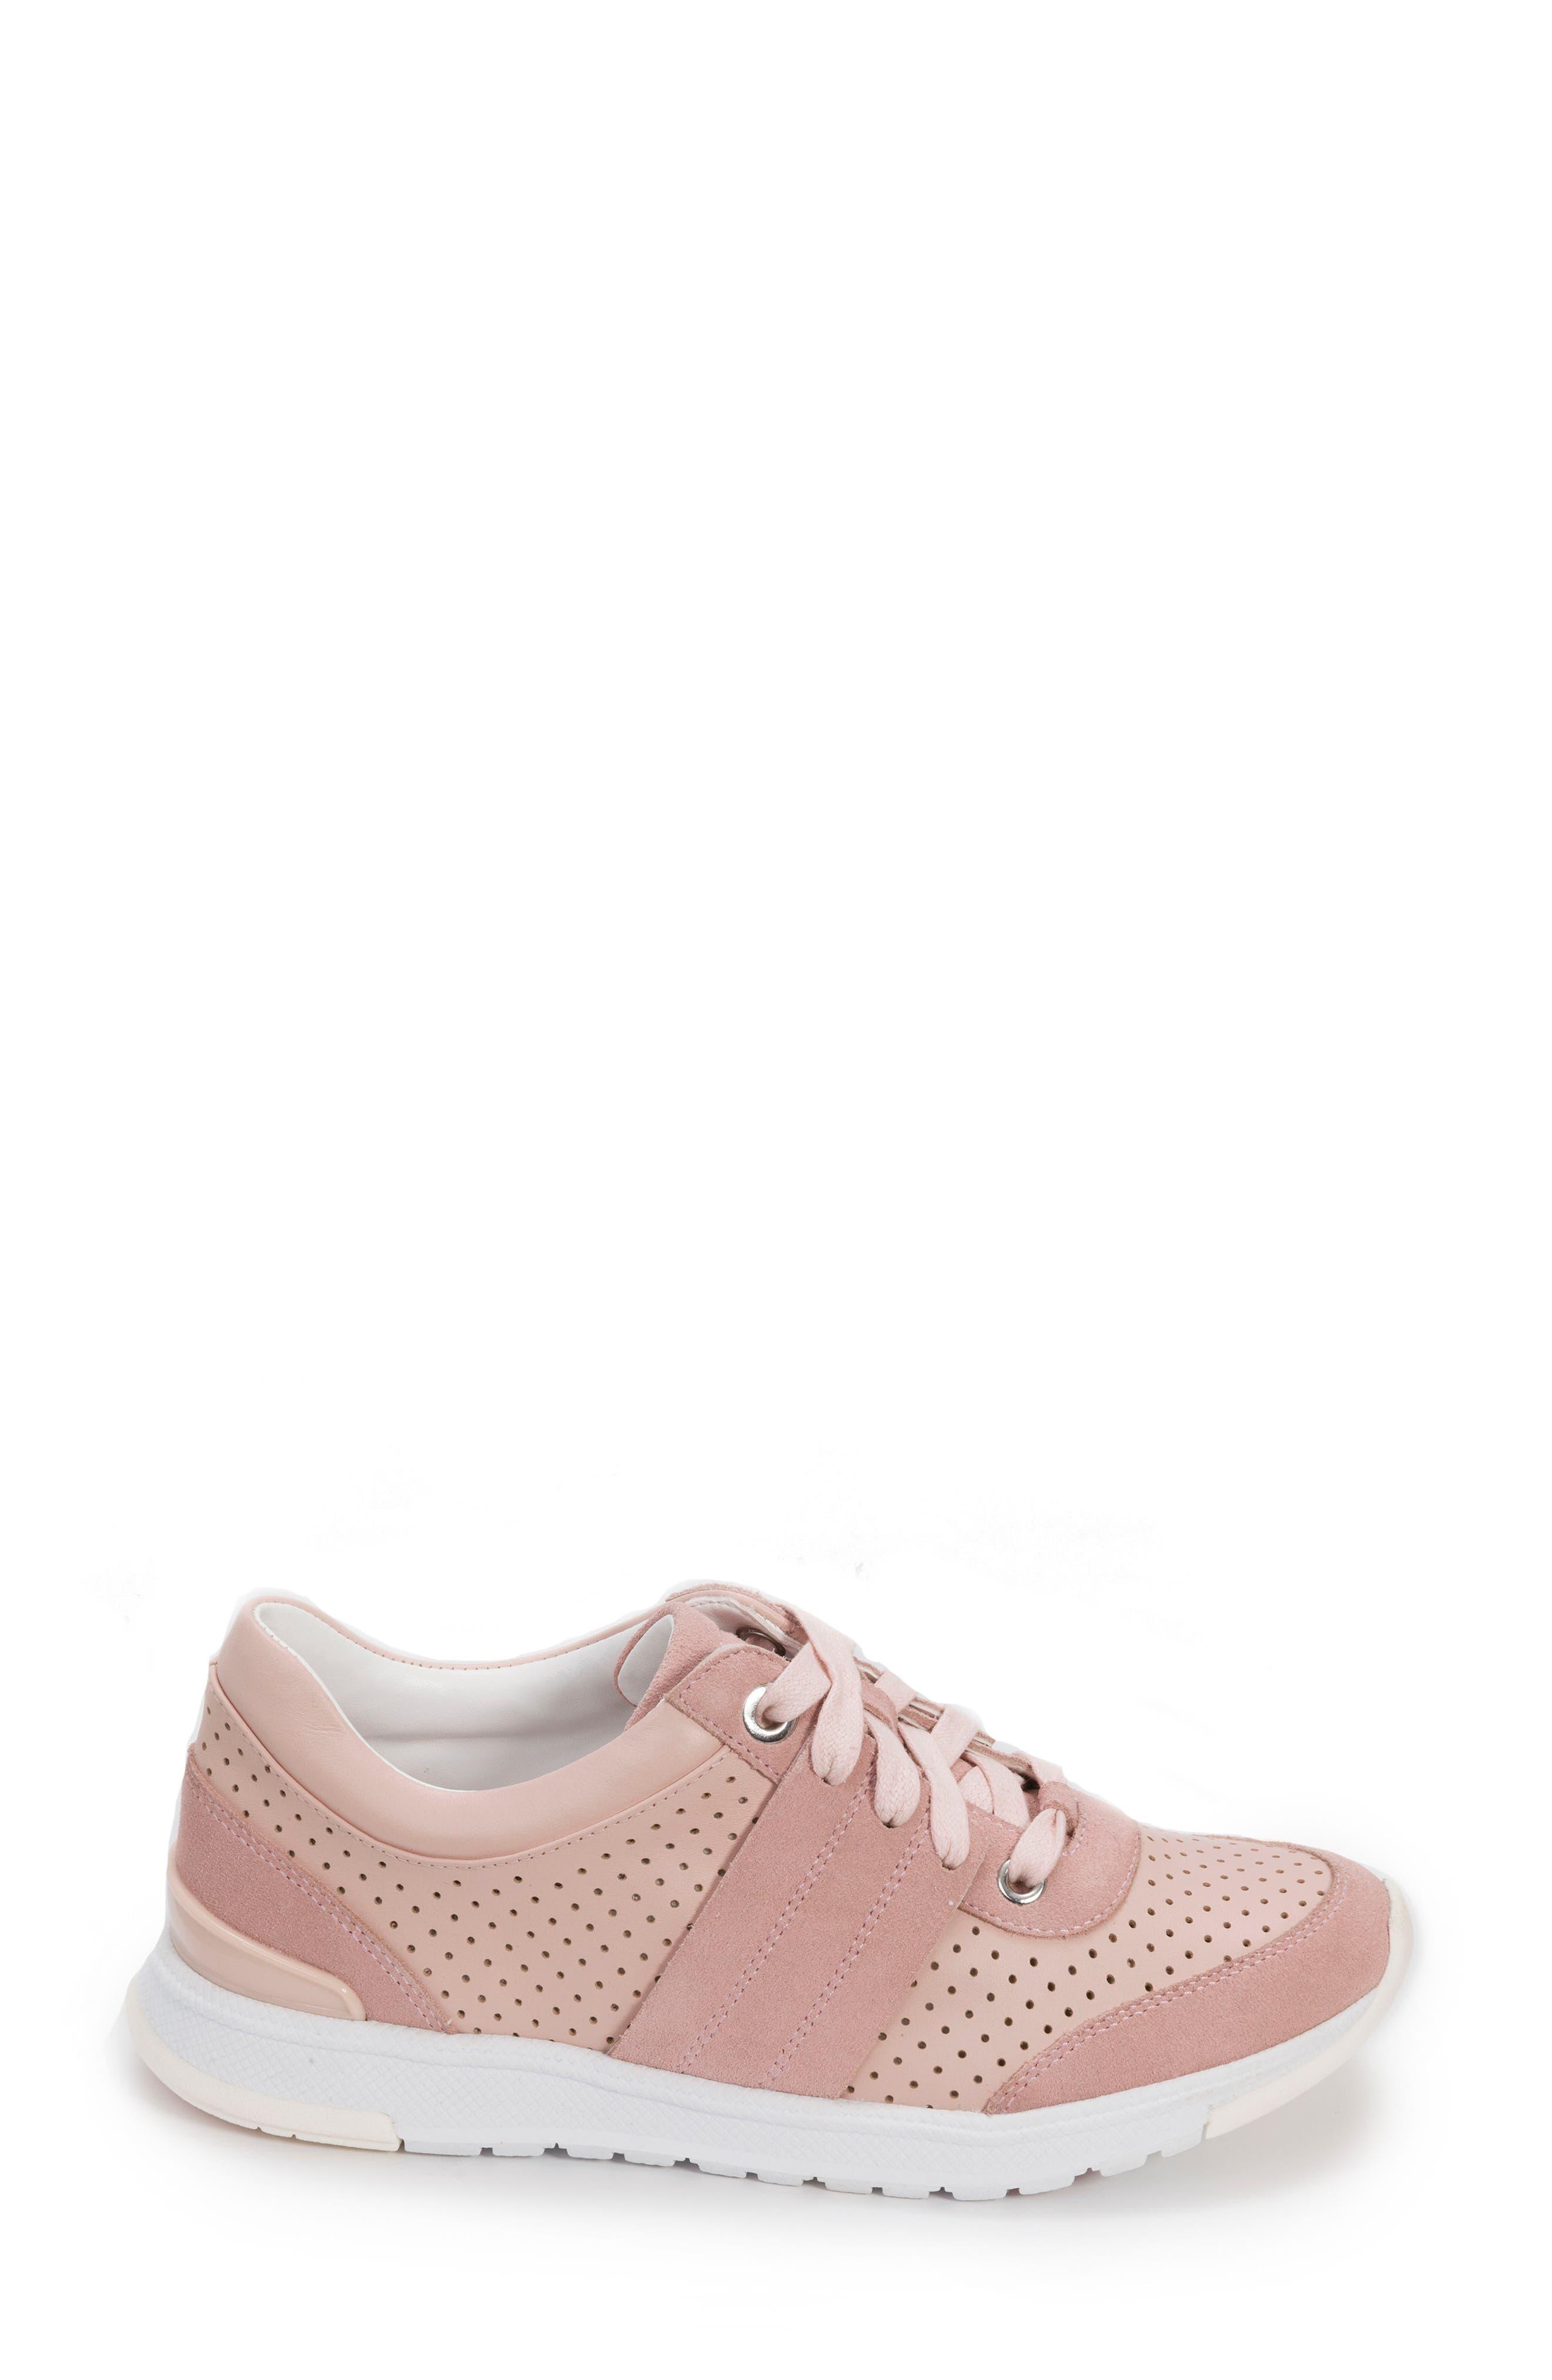 Bea Sneaker,                             Alternate thumbnail 3, color,                             Blush Leather